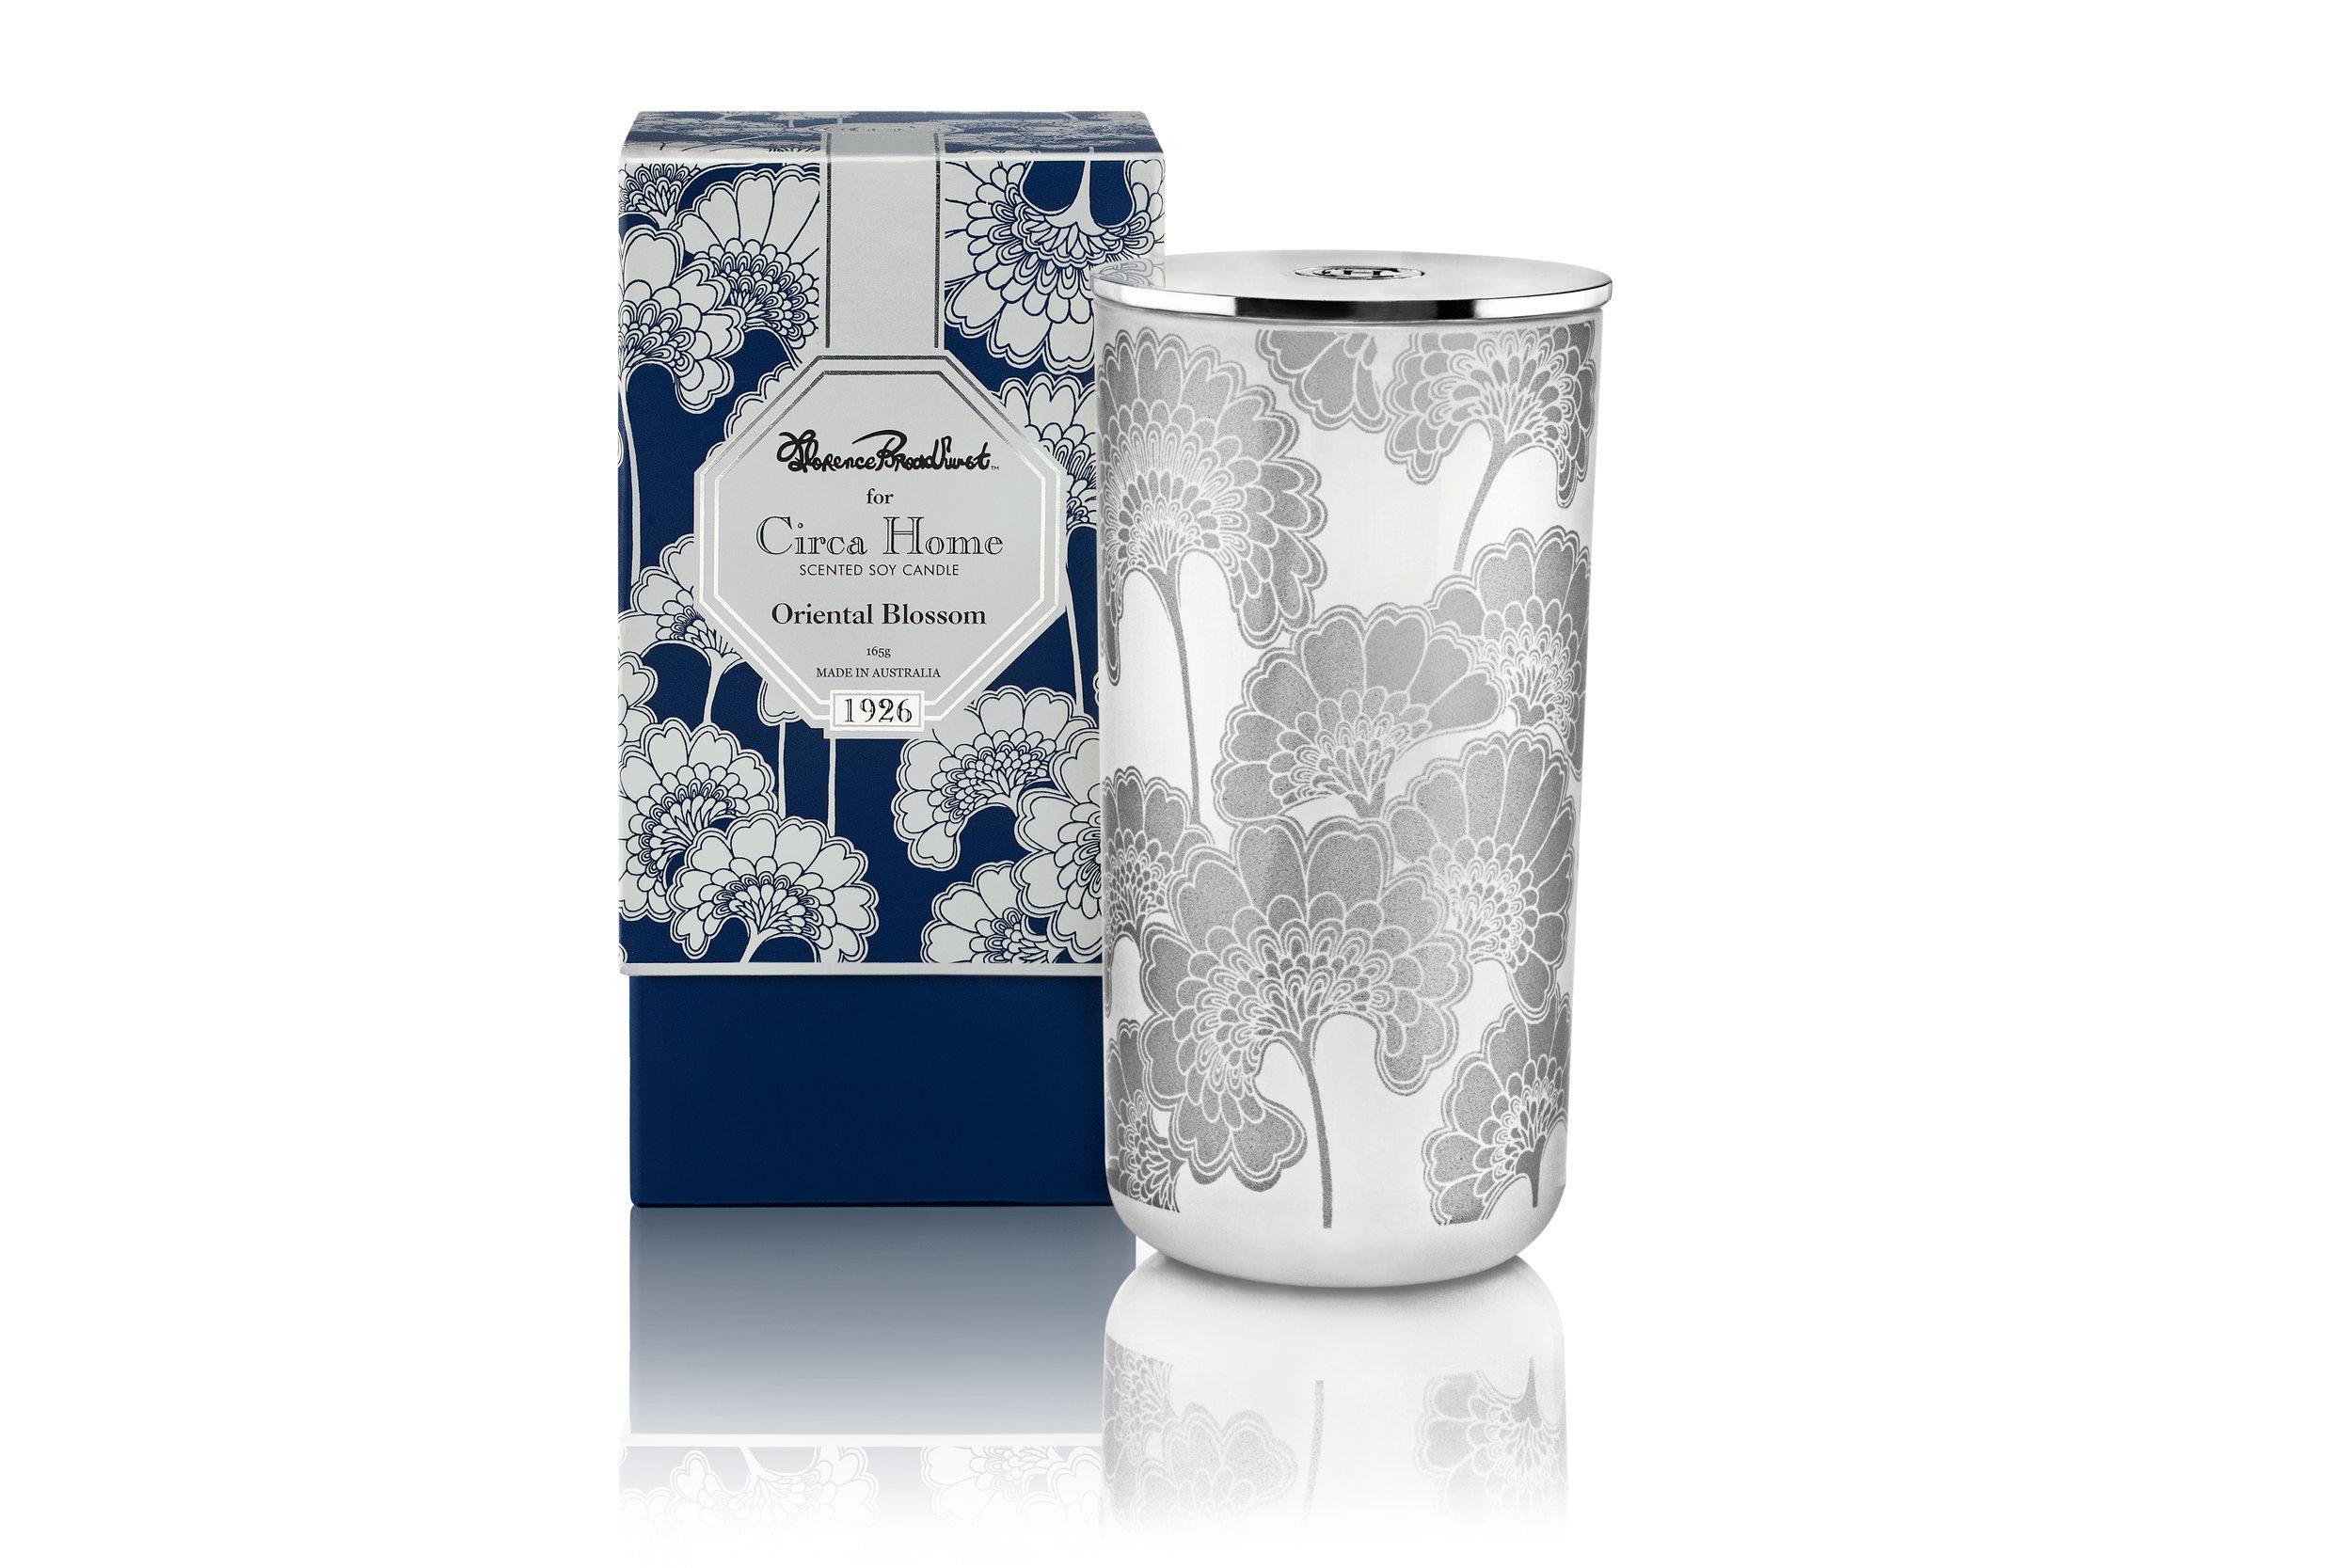 Circa Home Candle 165g Oriental Blossom.jpg